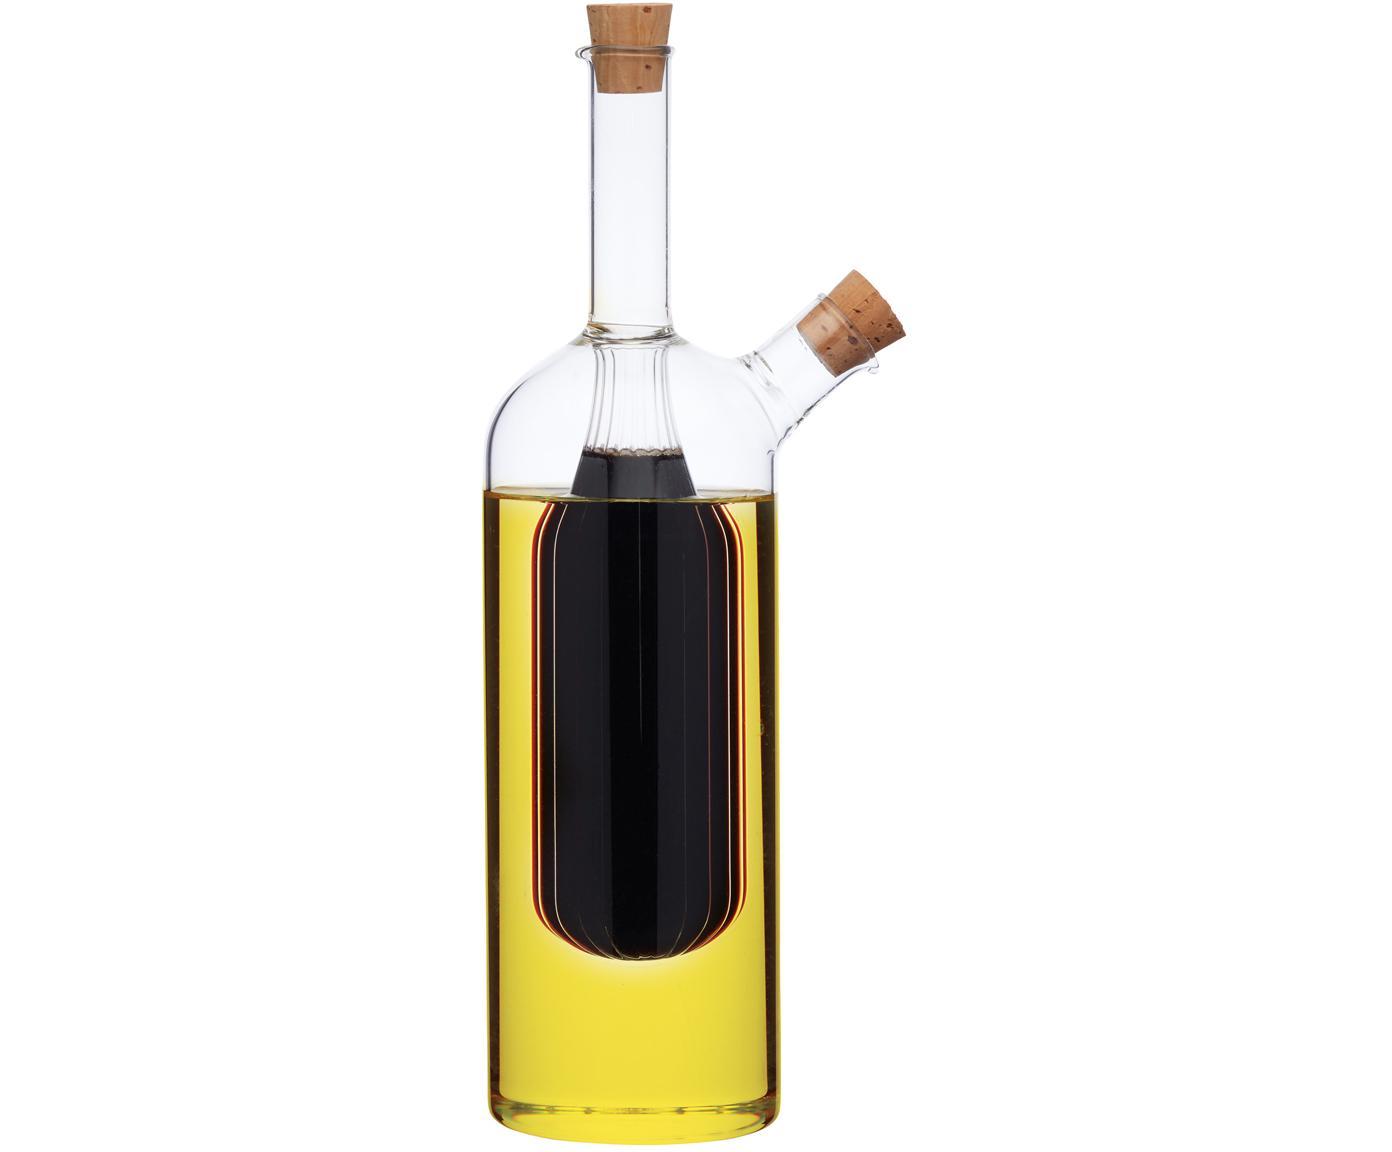 Set olio e aceto Ital, Vetro, Trasparente, Ø 6 x Alt. 24 cm